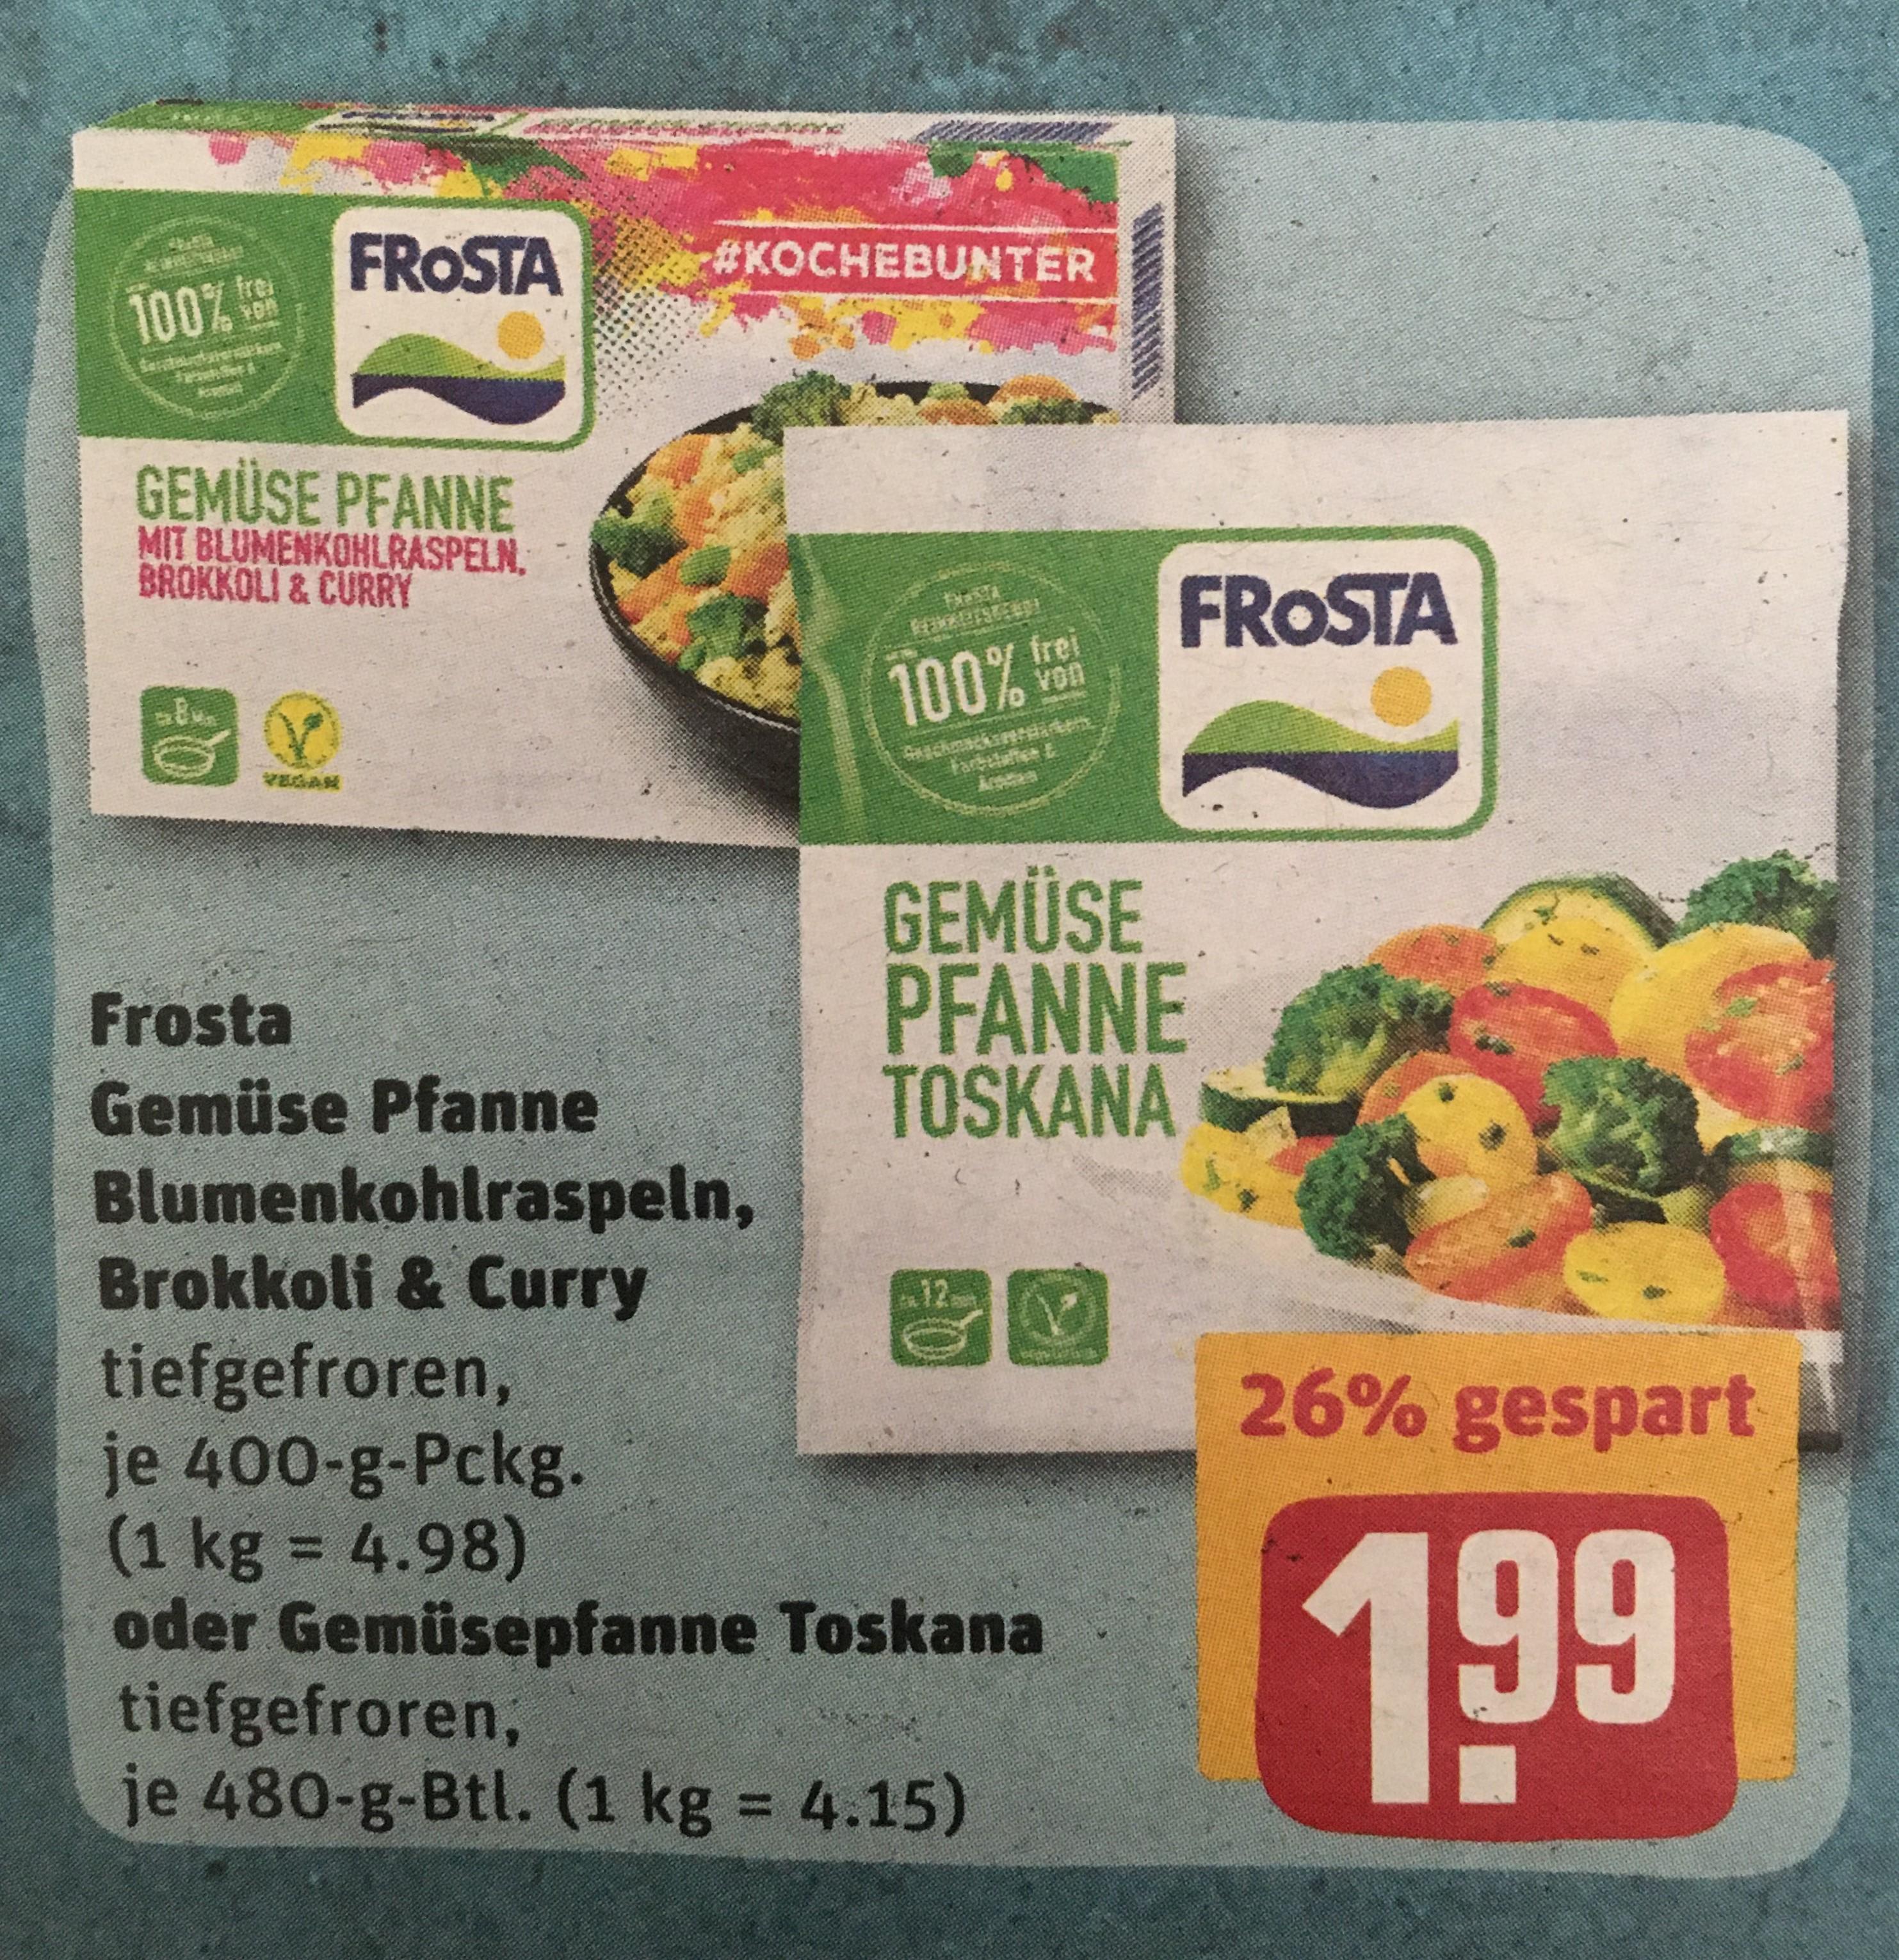 FROSTA Gemüsepfanne Toskana 480g oder Gemüse Pfanne Blummenkohlraspeln, Brokkoli & Curry 400g [REWE]